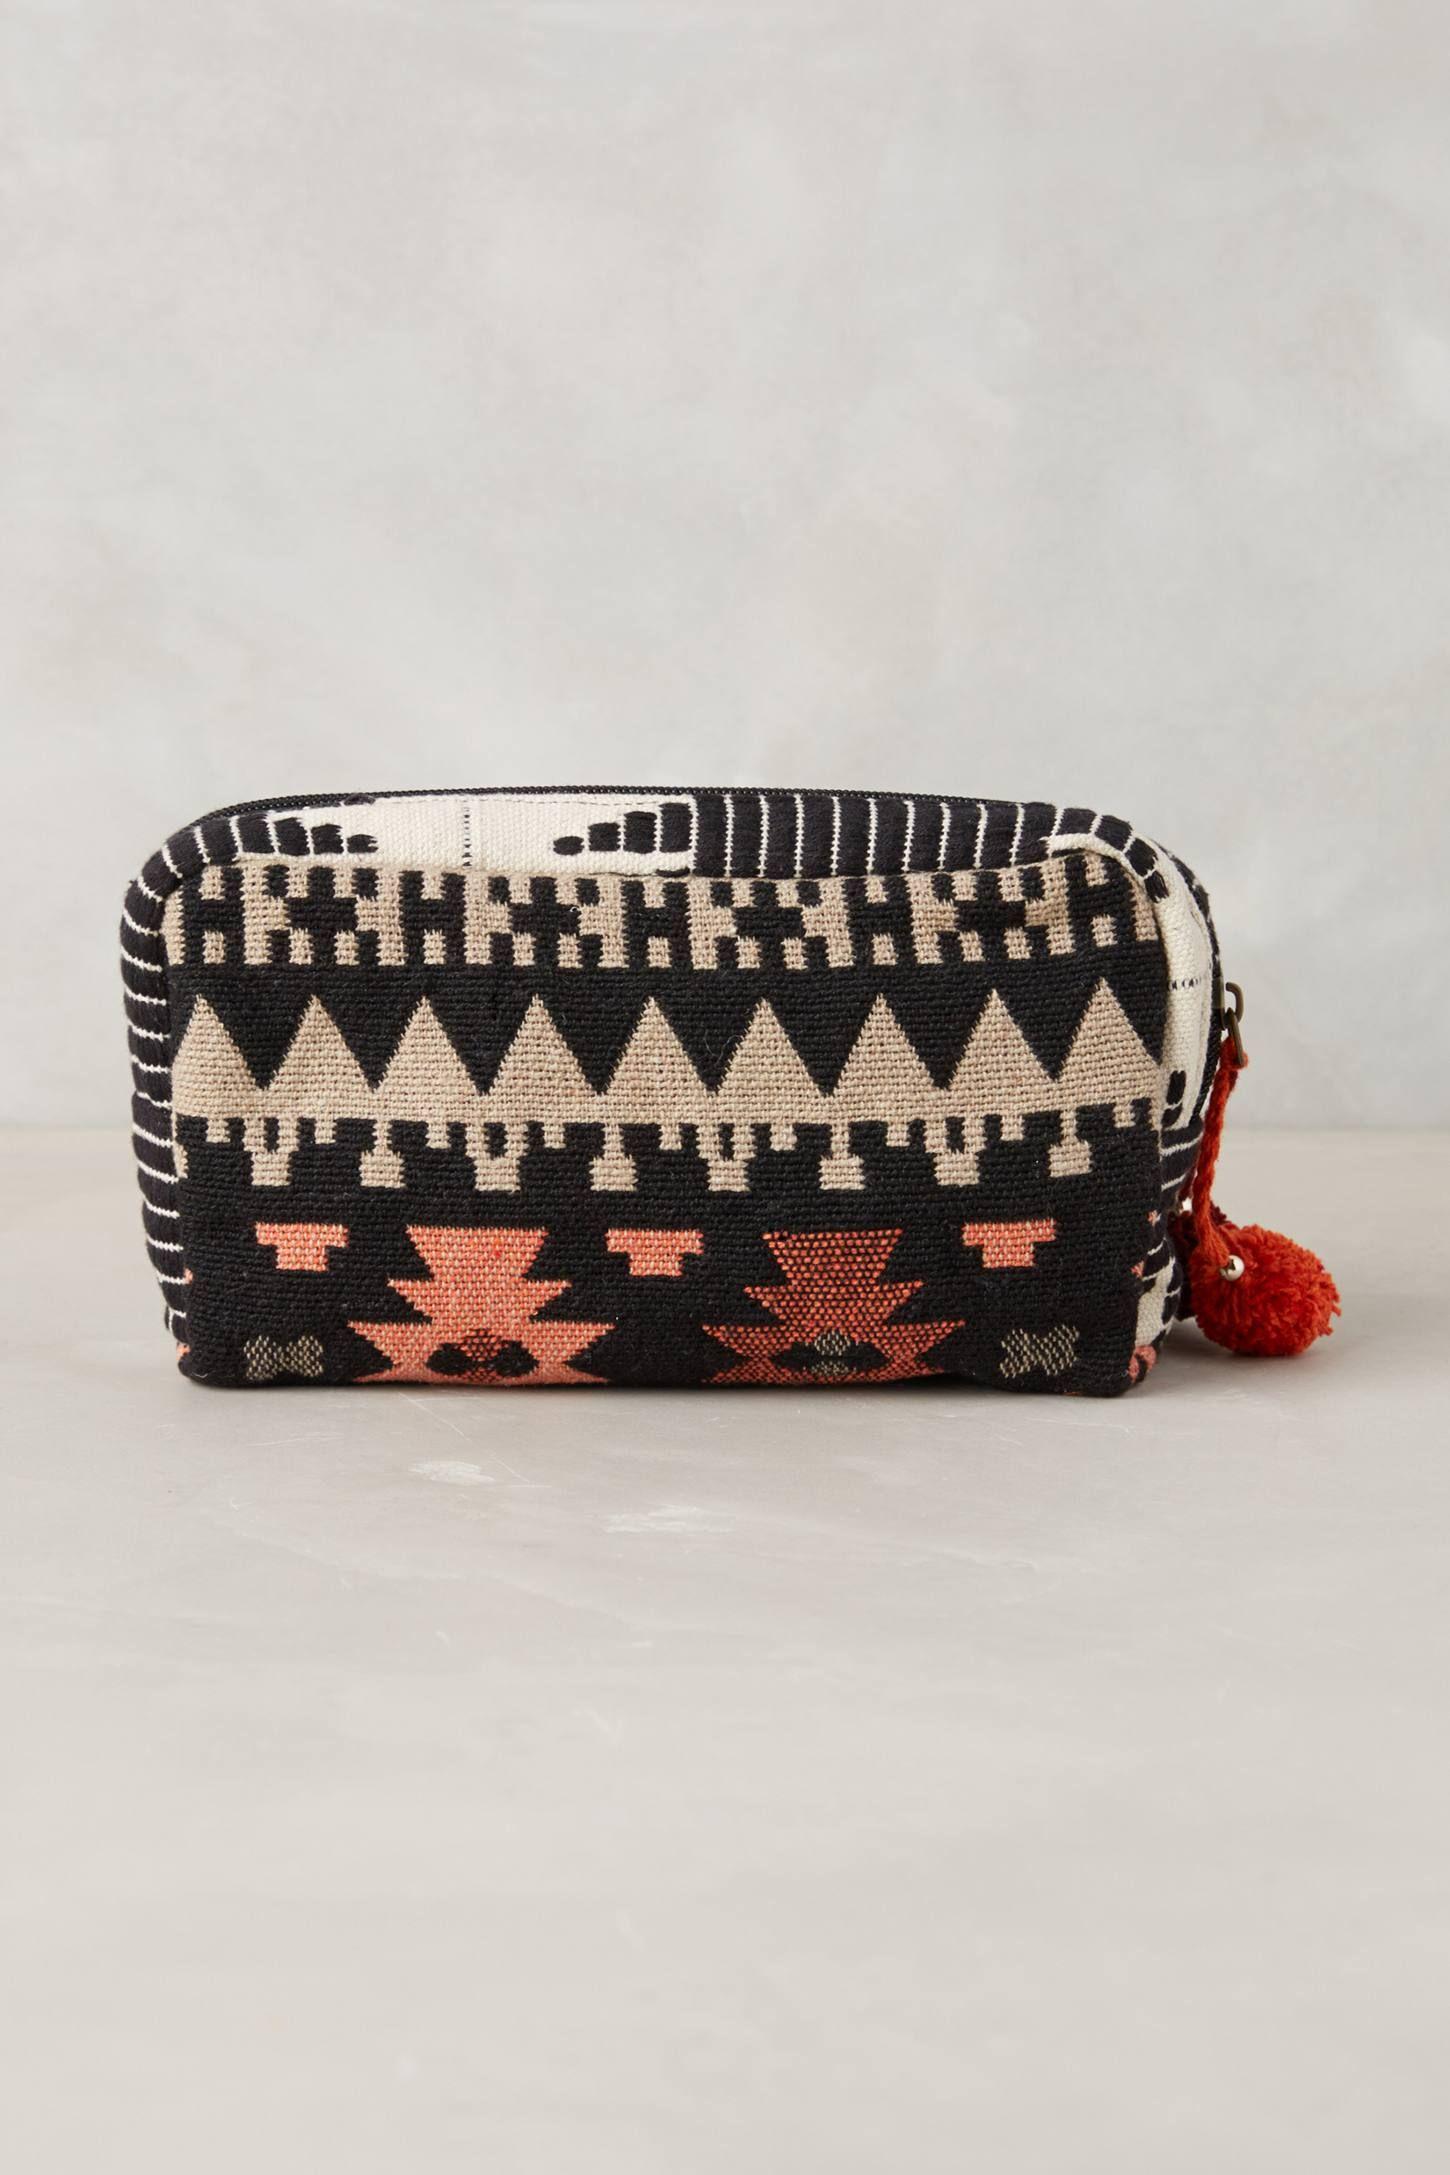 Ocllo Woven Cosmetic Bag - anthropologie.com